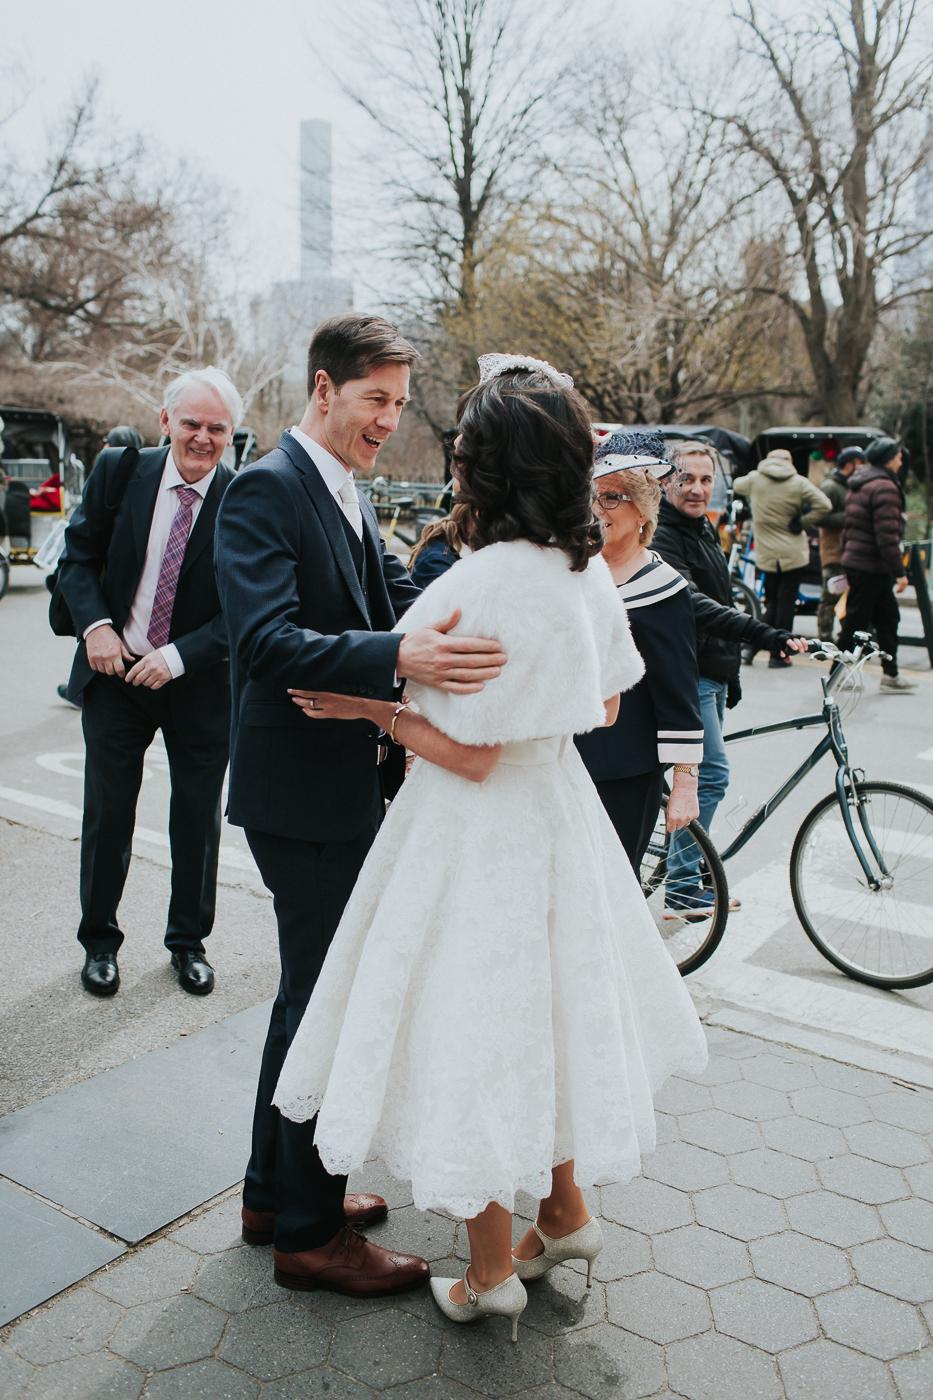 Ladies-Pavilion-Central-Park-NYC-Documentary-Elopement-Wedding-Photographer-11.jpg